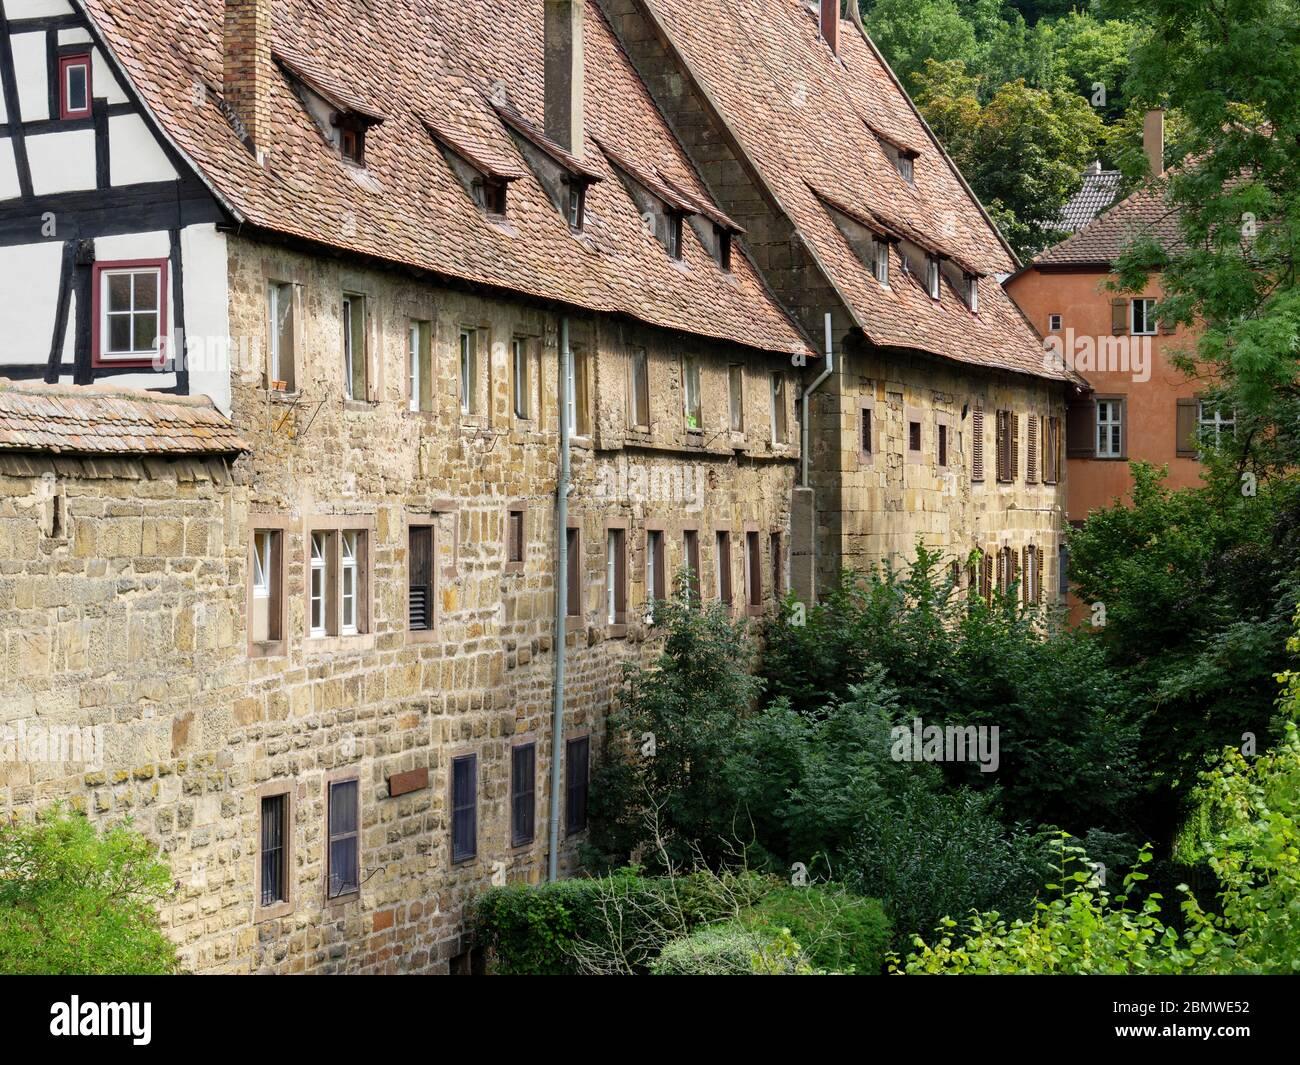 Kloster Maulbronn, UNESCO Welterbe, Baden-Württemberg, Deutschland Stock Photo